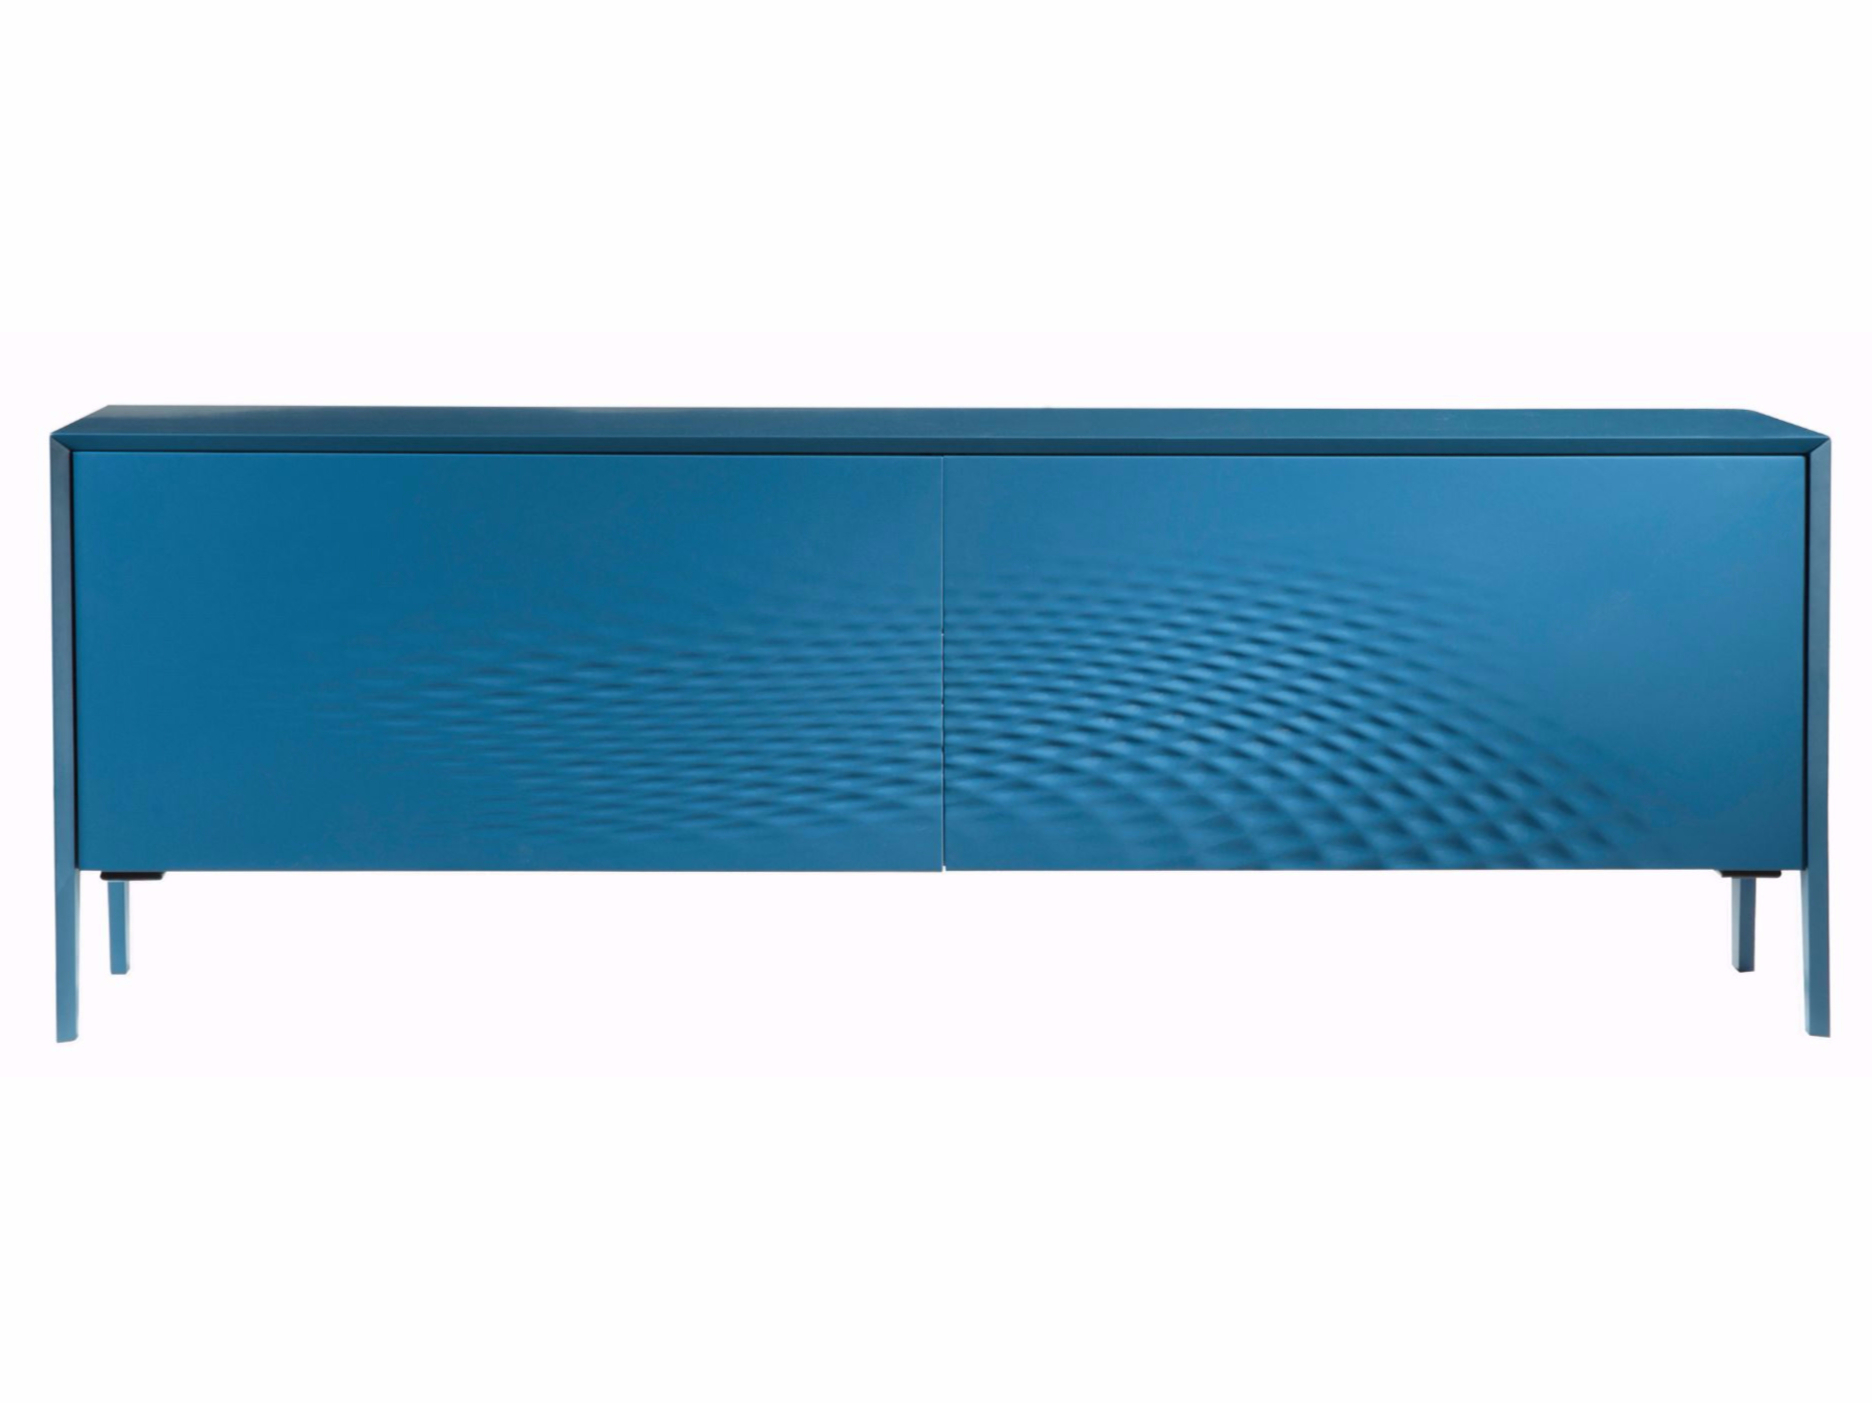 Buffet Roche Bobois Trendy Water Drop Sideboard Sacha Lakic  # Buffet Roche Bobois